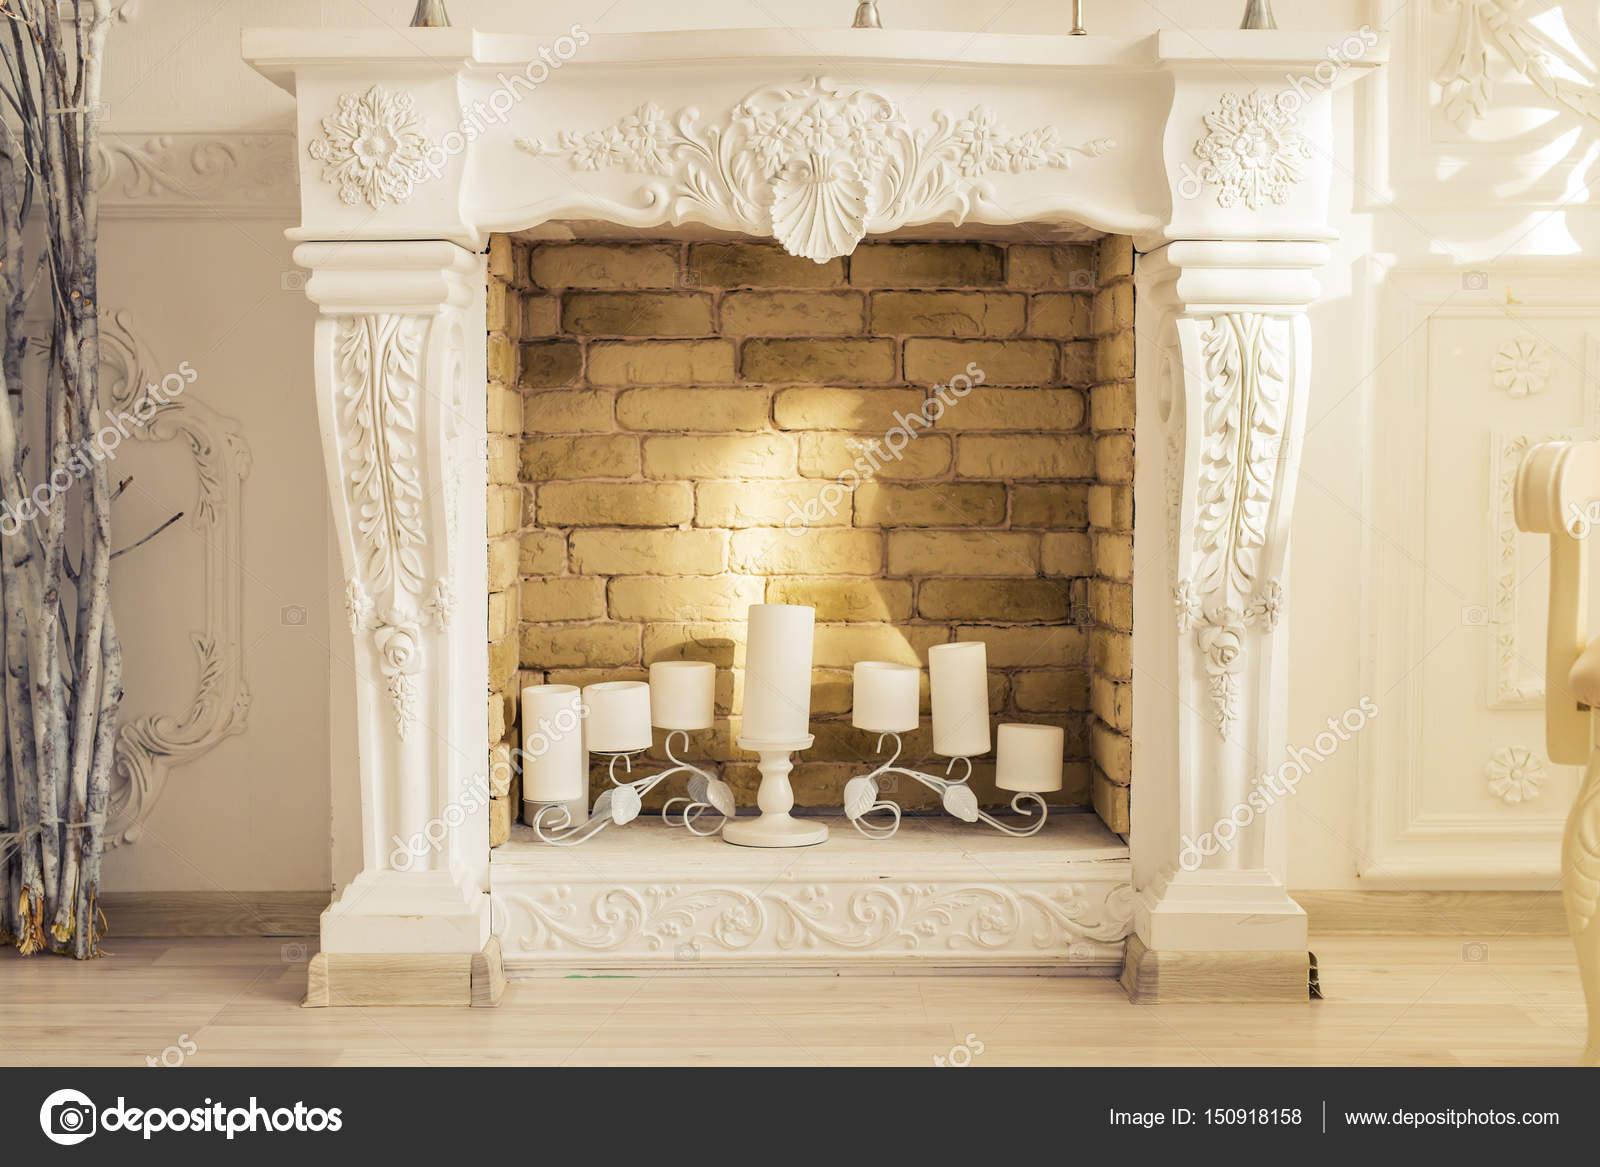 Weisse Dekorative Kamin Mit Kerzen Stockfoto C Satura 150918158